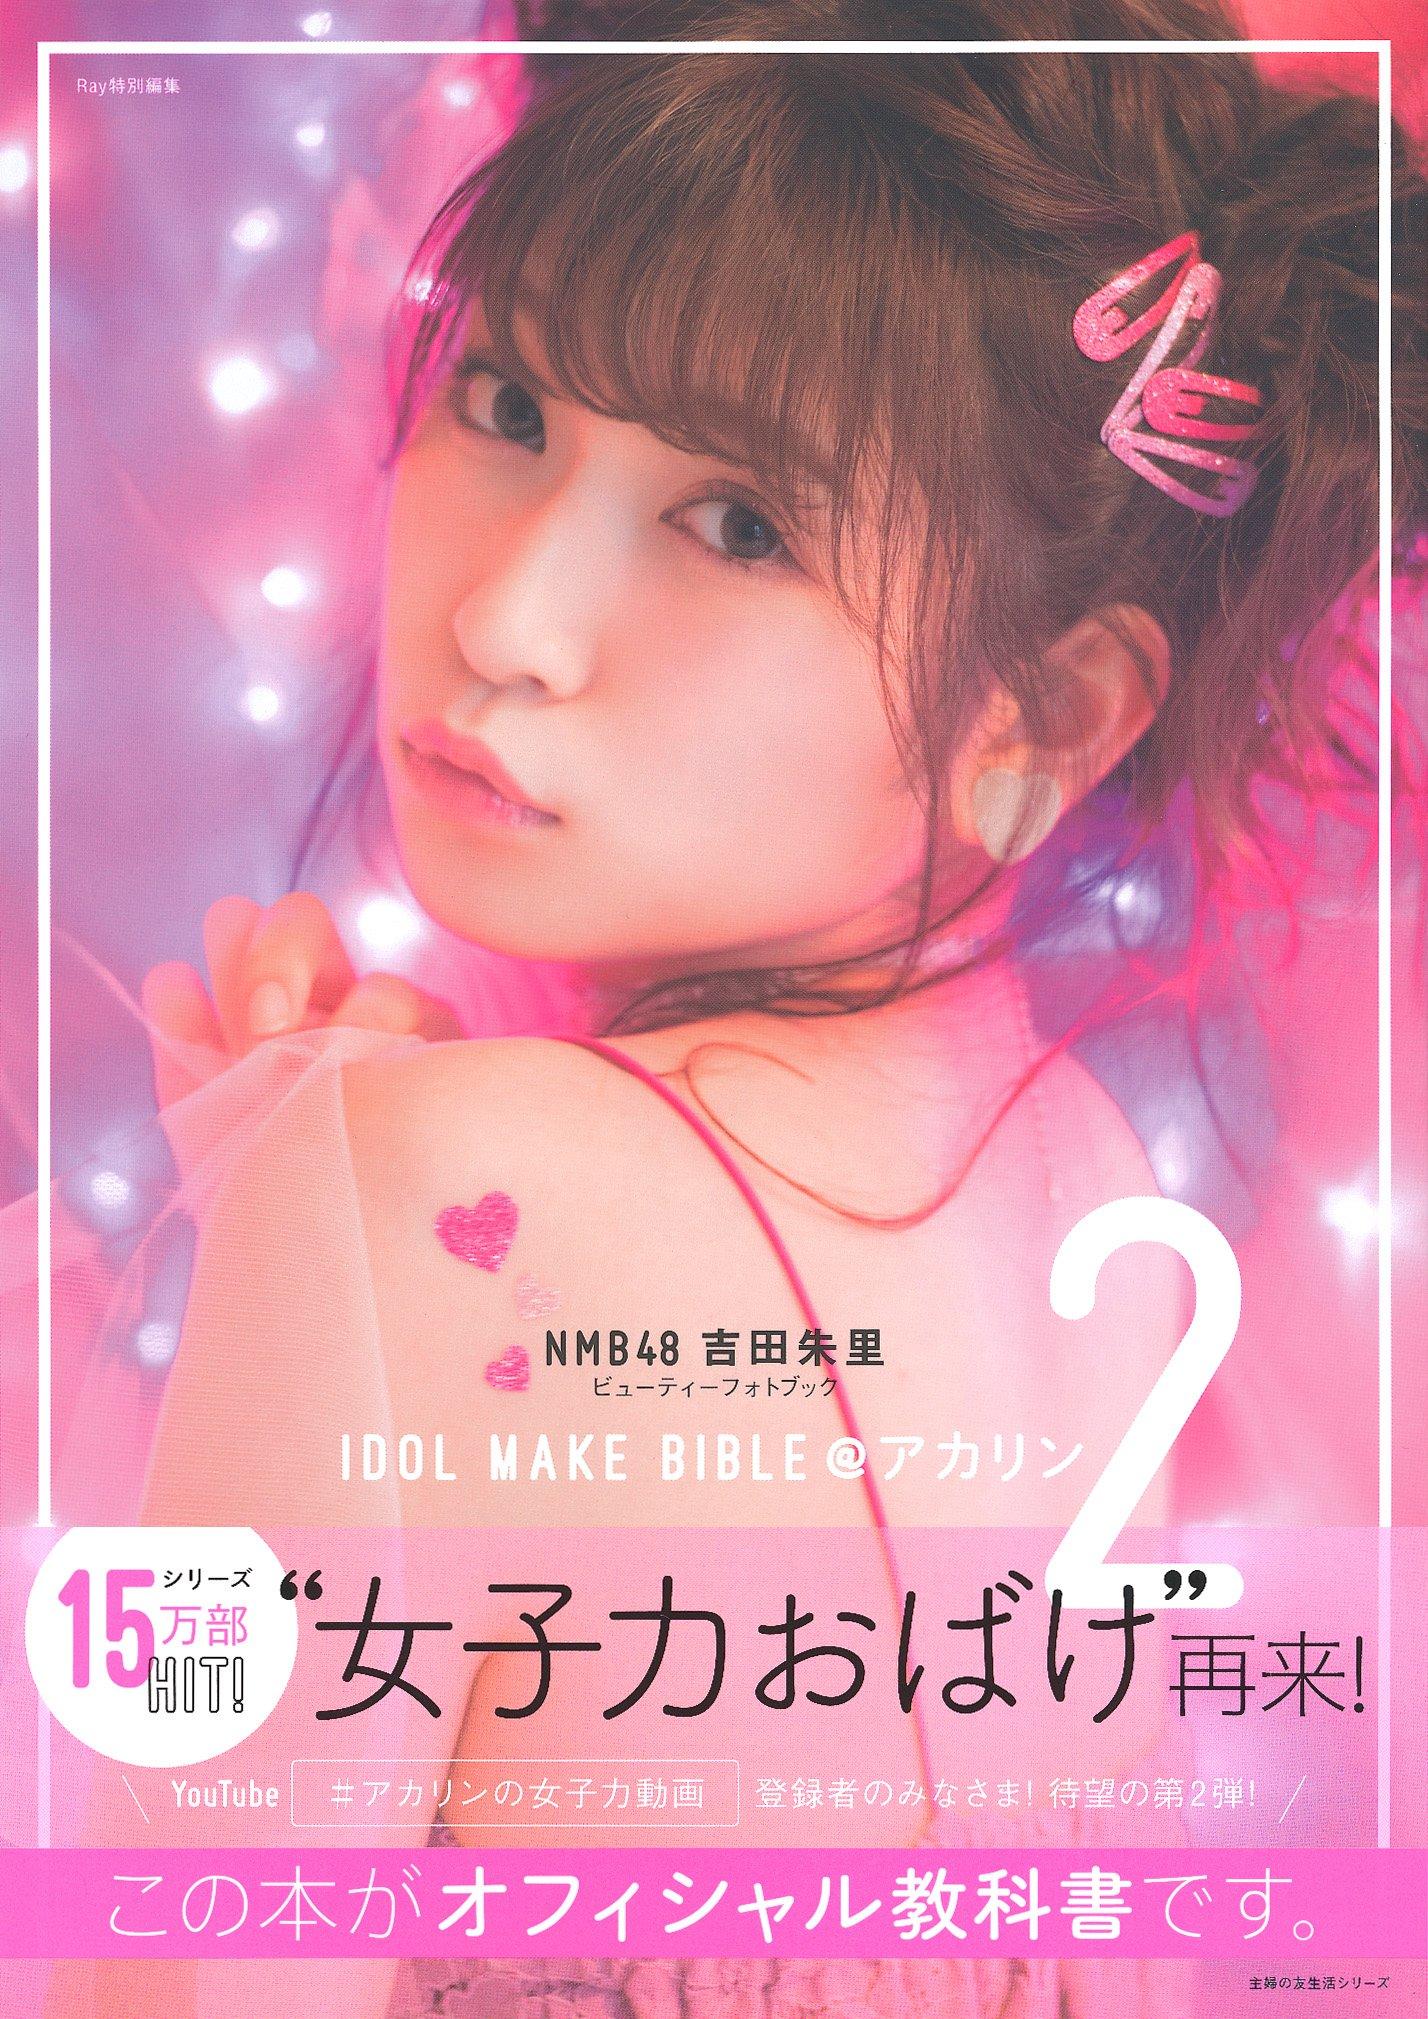 NMB48 吉田朱里 ビューティーフォトブック IDOL MAKE BIBLE @ アカリン2 (主婦の友生活シリーズ)